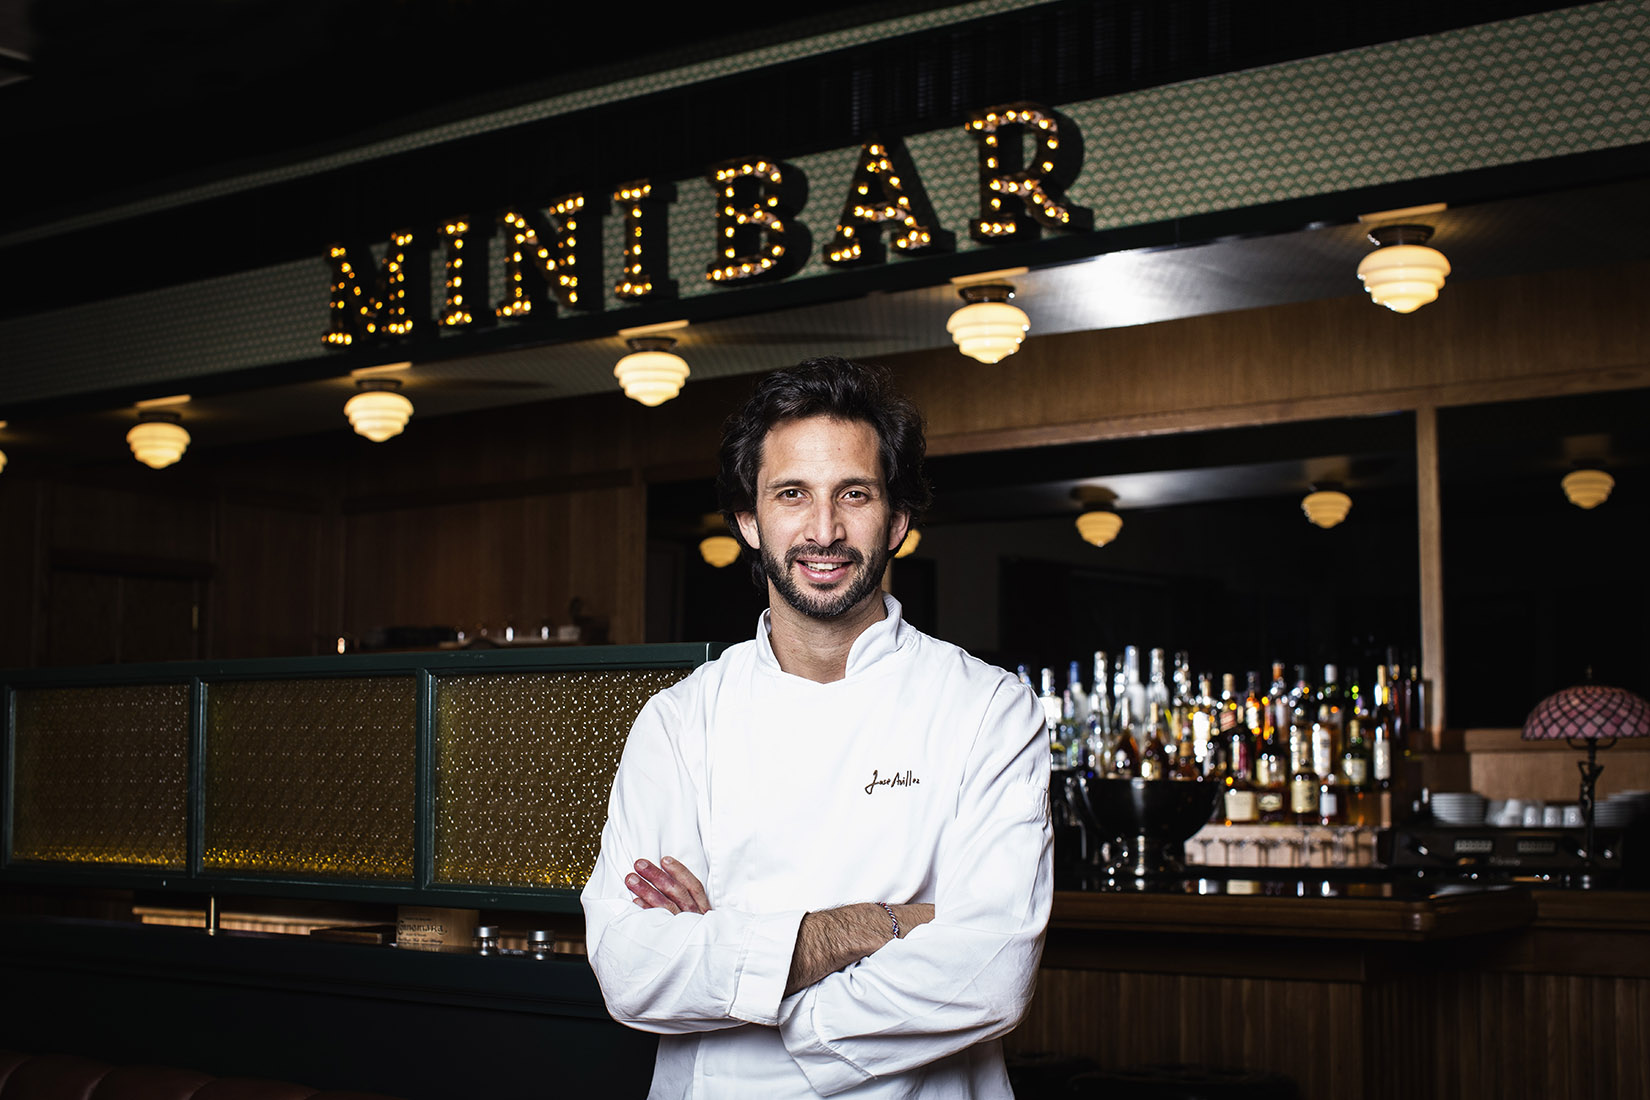 Have You Heard About Chef Avillez's Gastronomic Bar? mini bar Have You Heard About Chef Avillez's Gastronomic Bar? Jos2